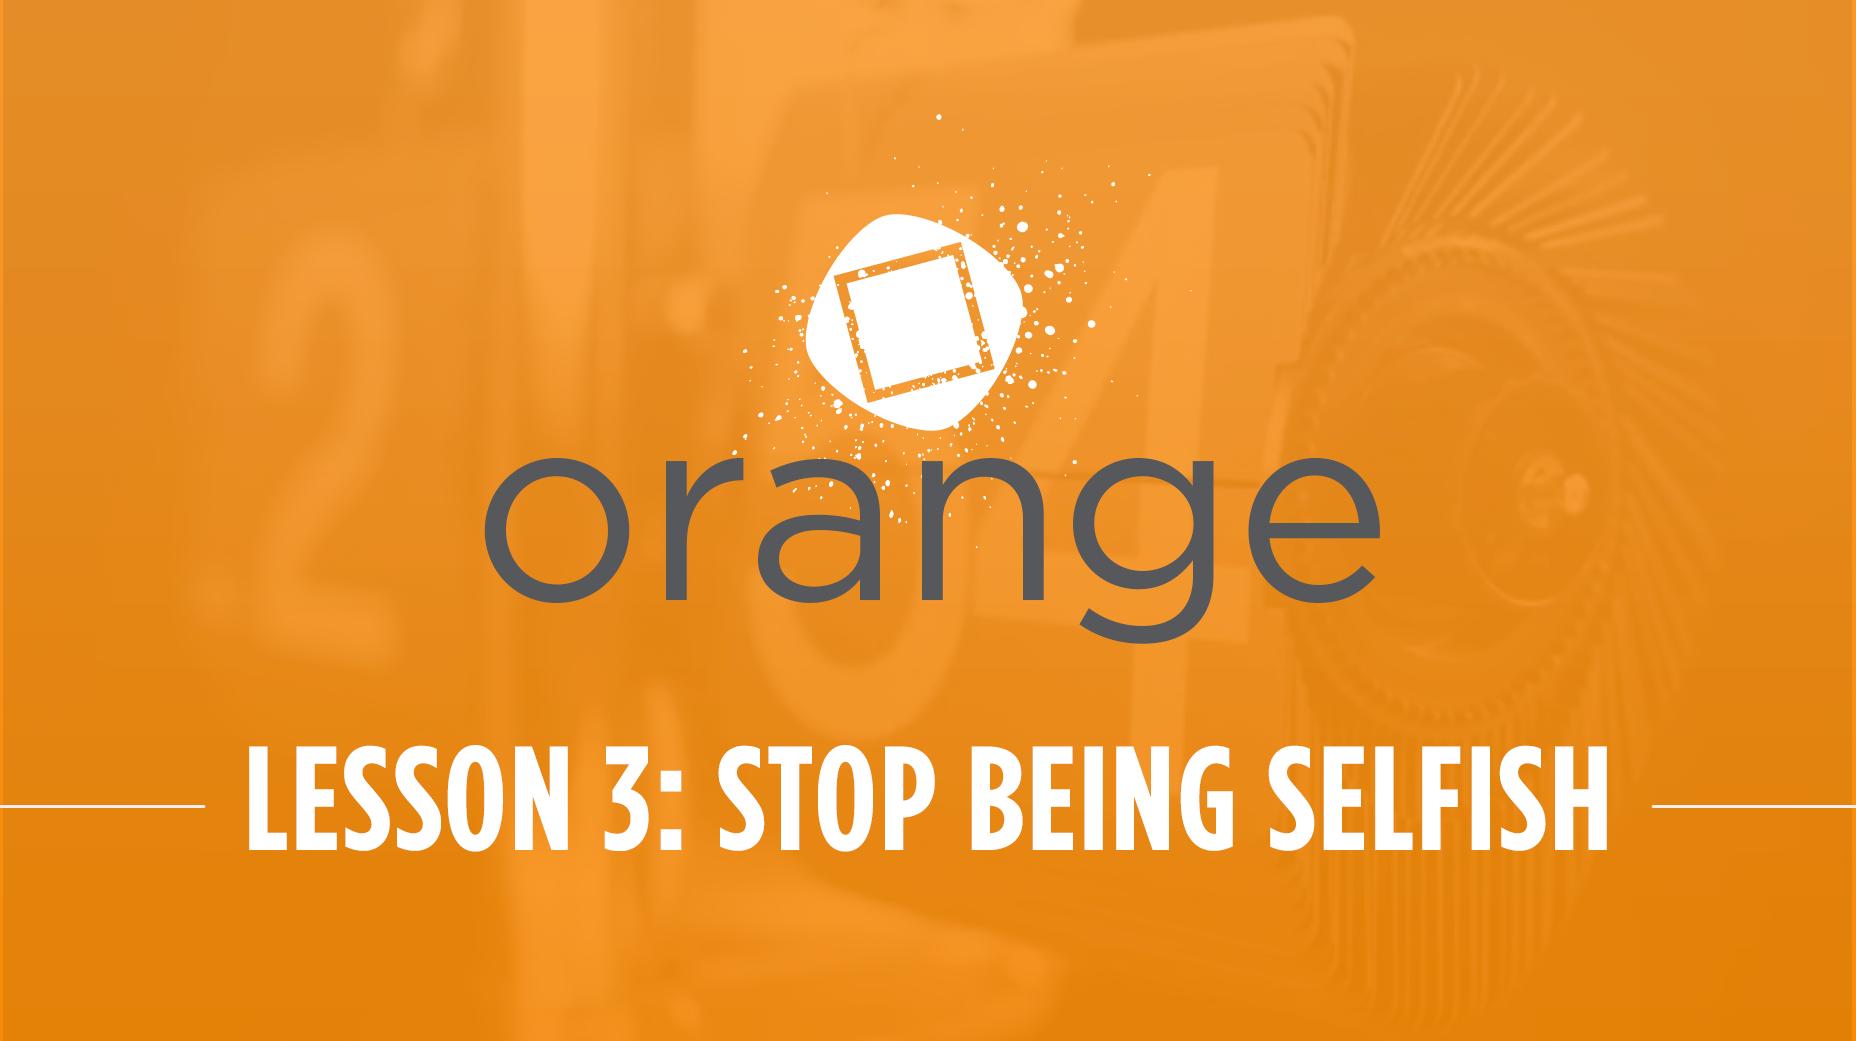 Orange – Lesson 3: Stop Being Selfish